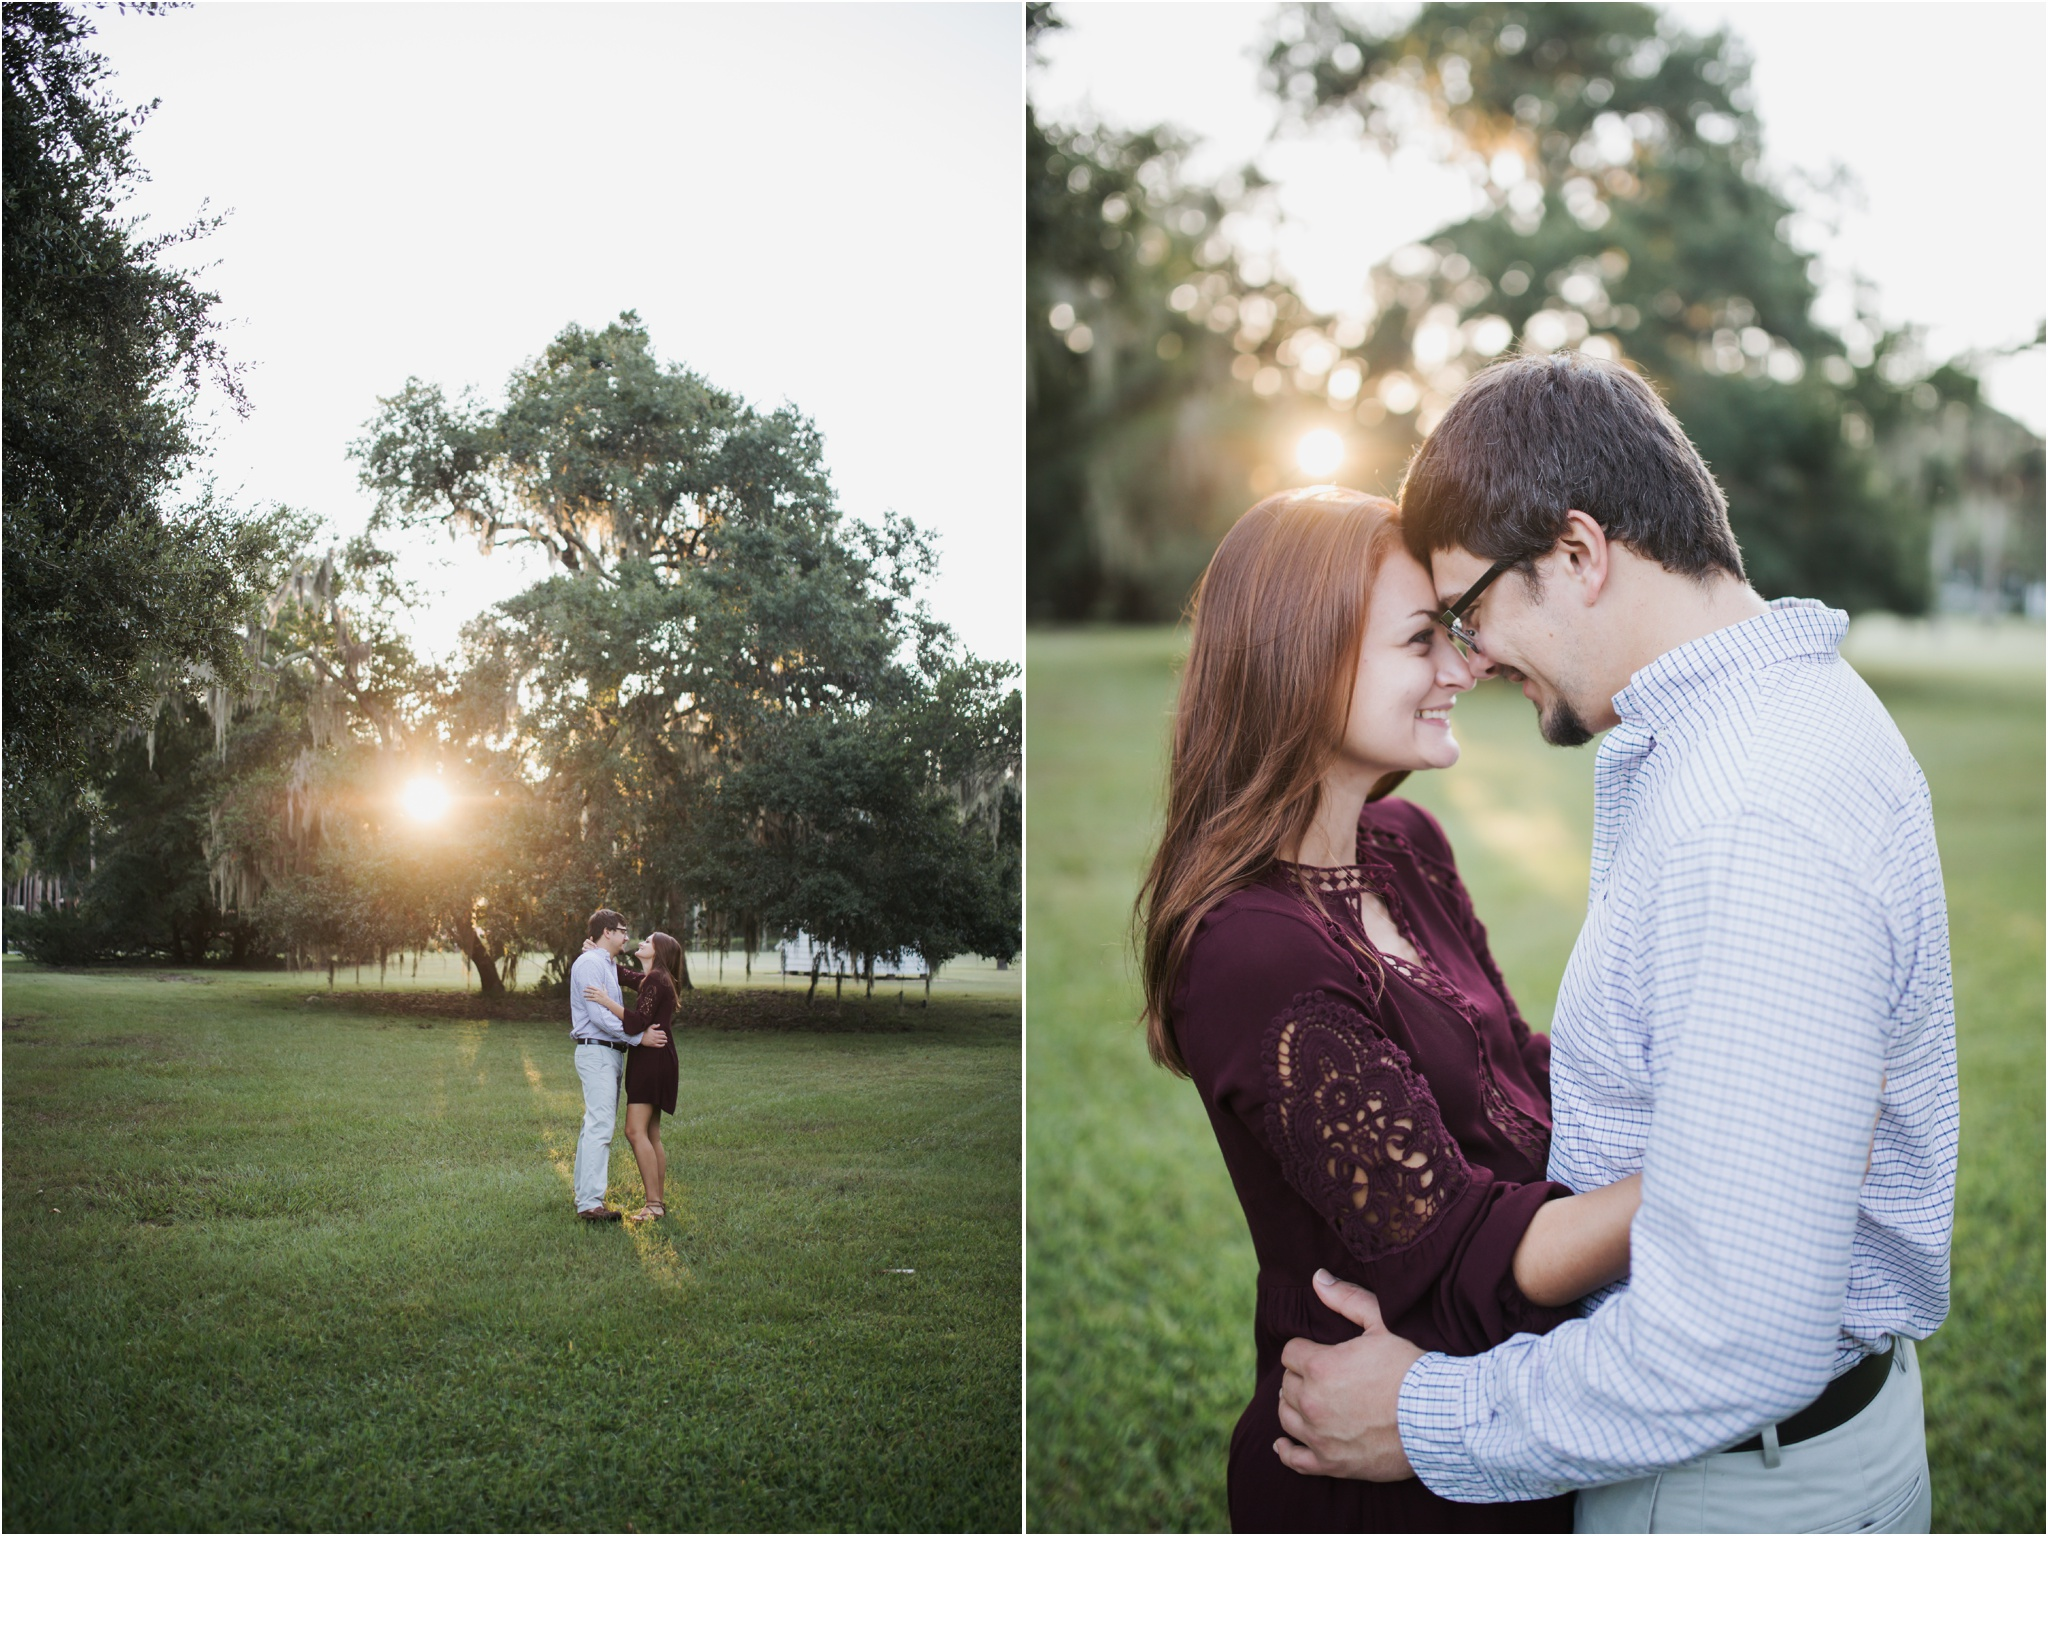 Rainey_Gregg_Photography_St._Simons_Island_Georgia_California_Wedding_Portrait_Photography_1377.jpg